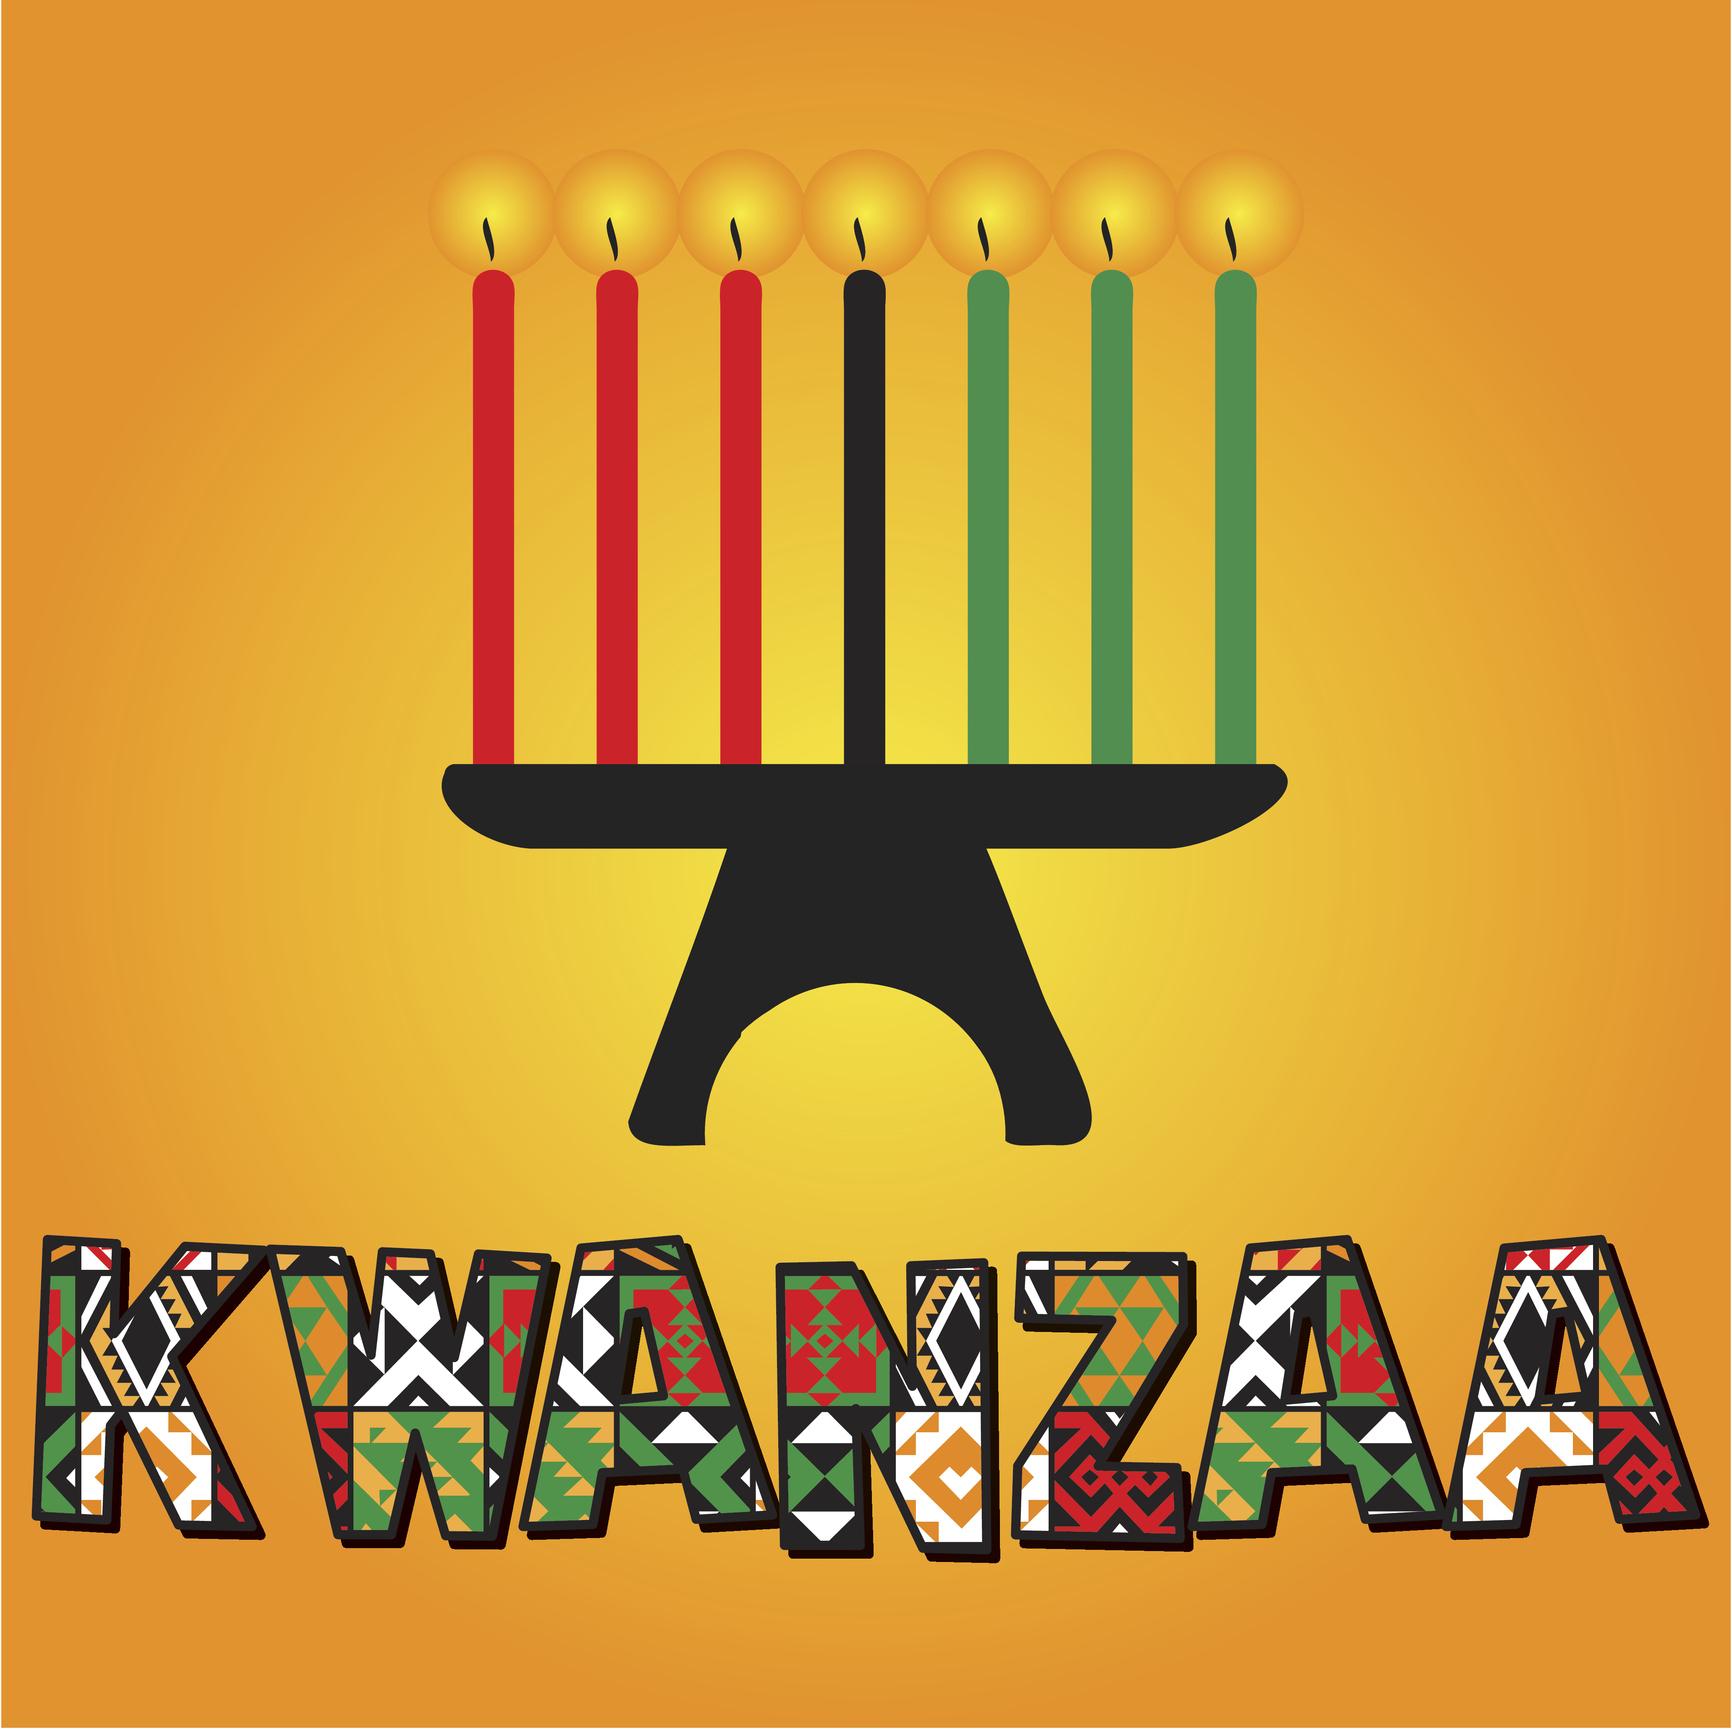 The 7 Principles Of Kwanzaa